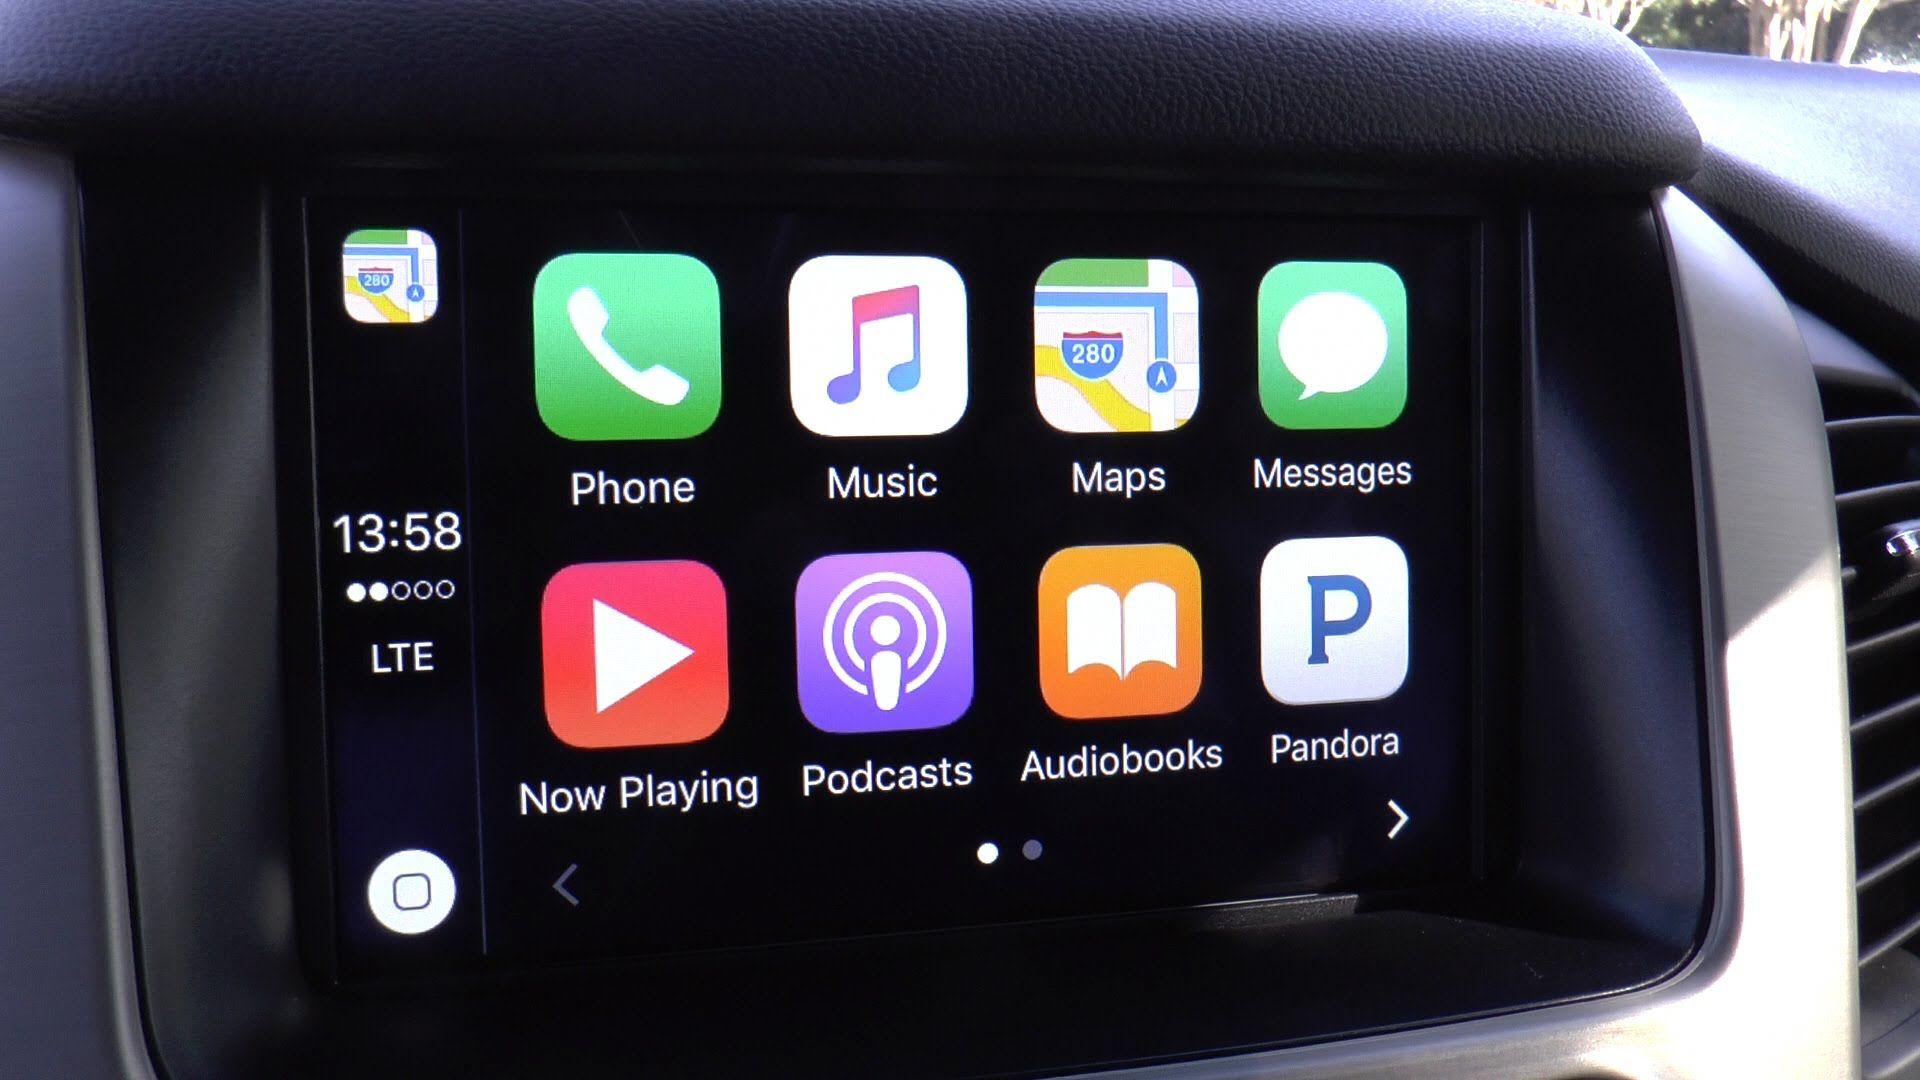 LTC GM's Apple CarPlay (2016 GMC Yukon Denali XL) (With